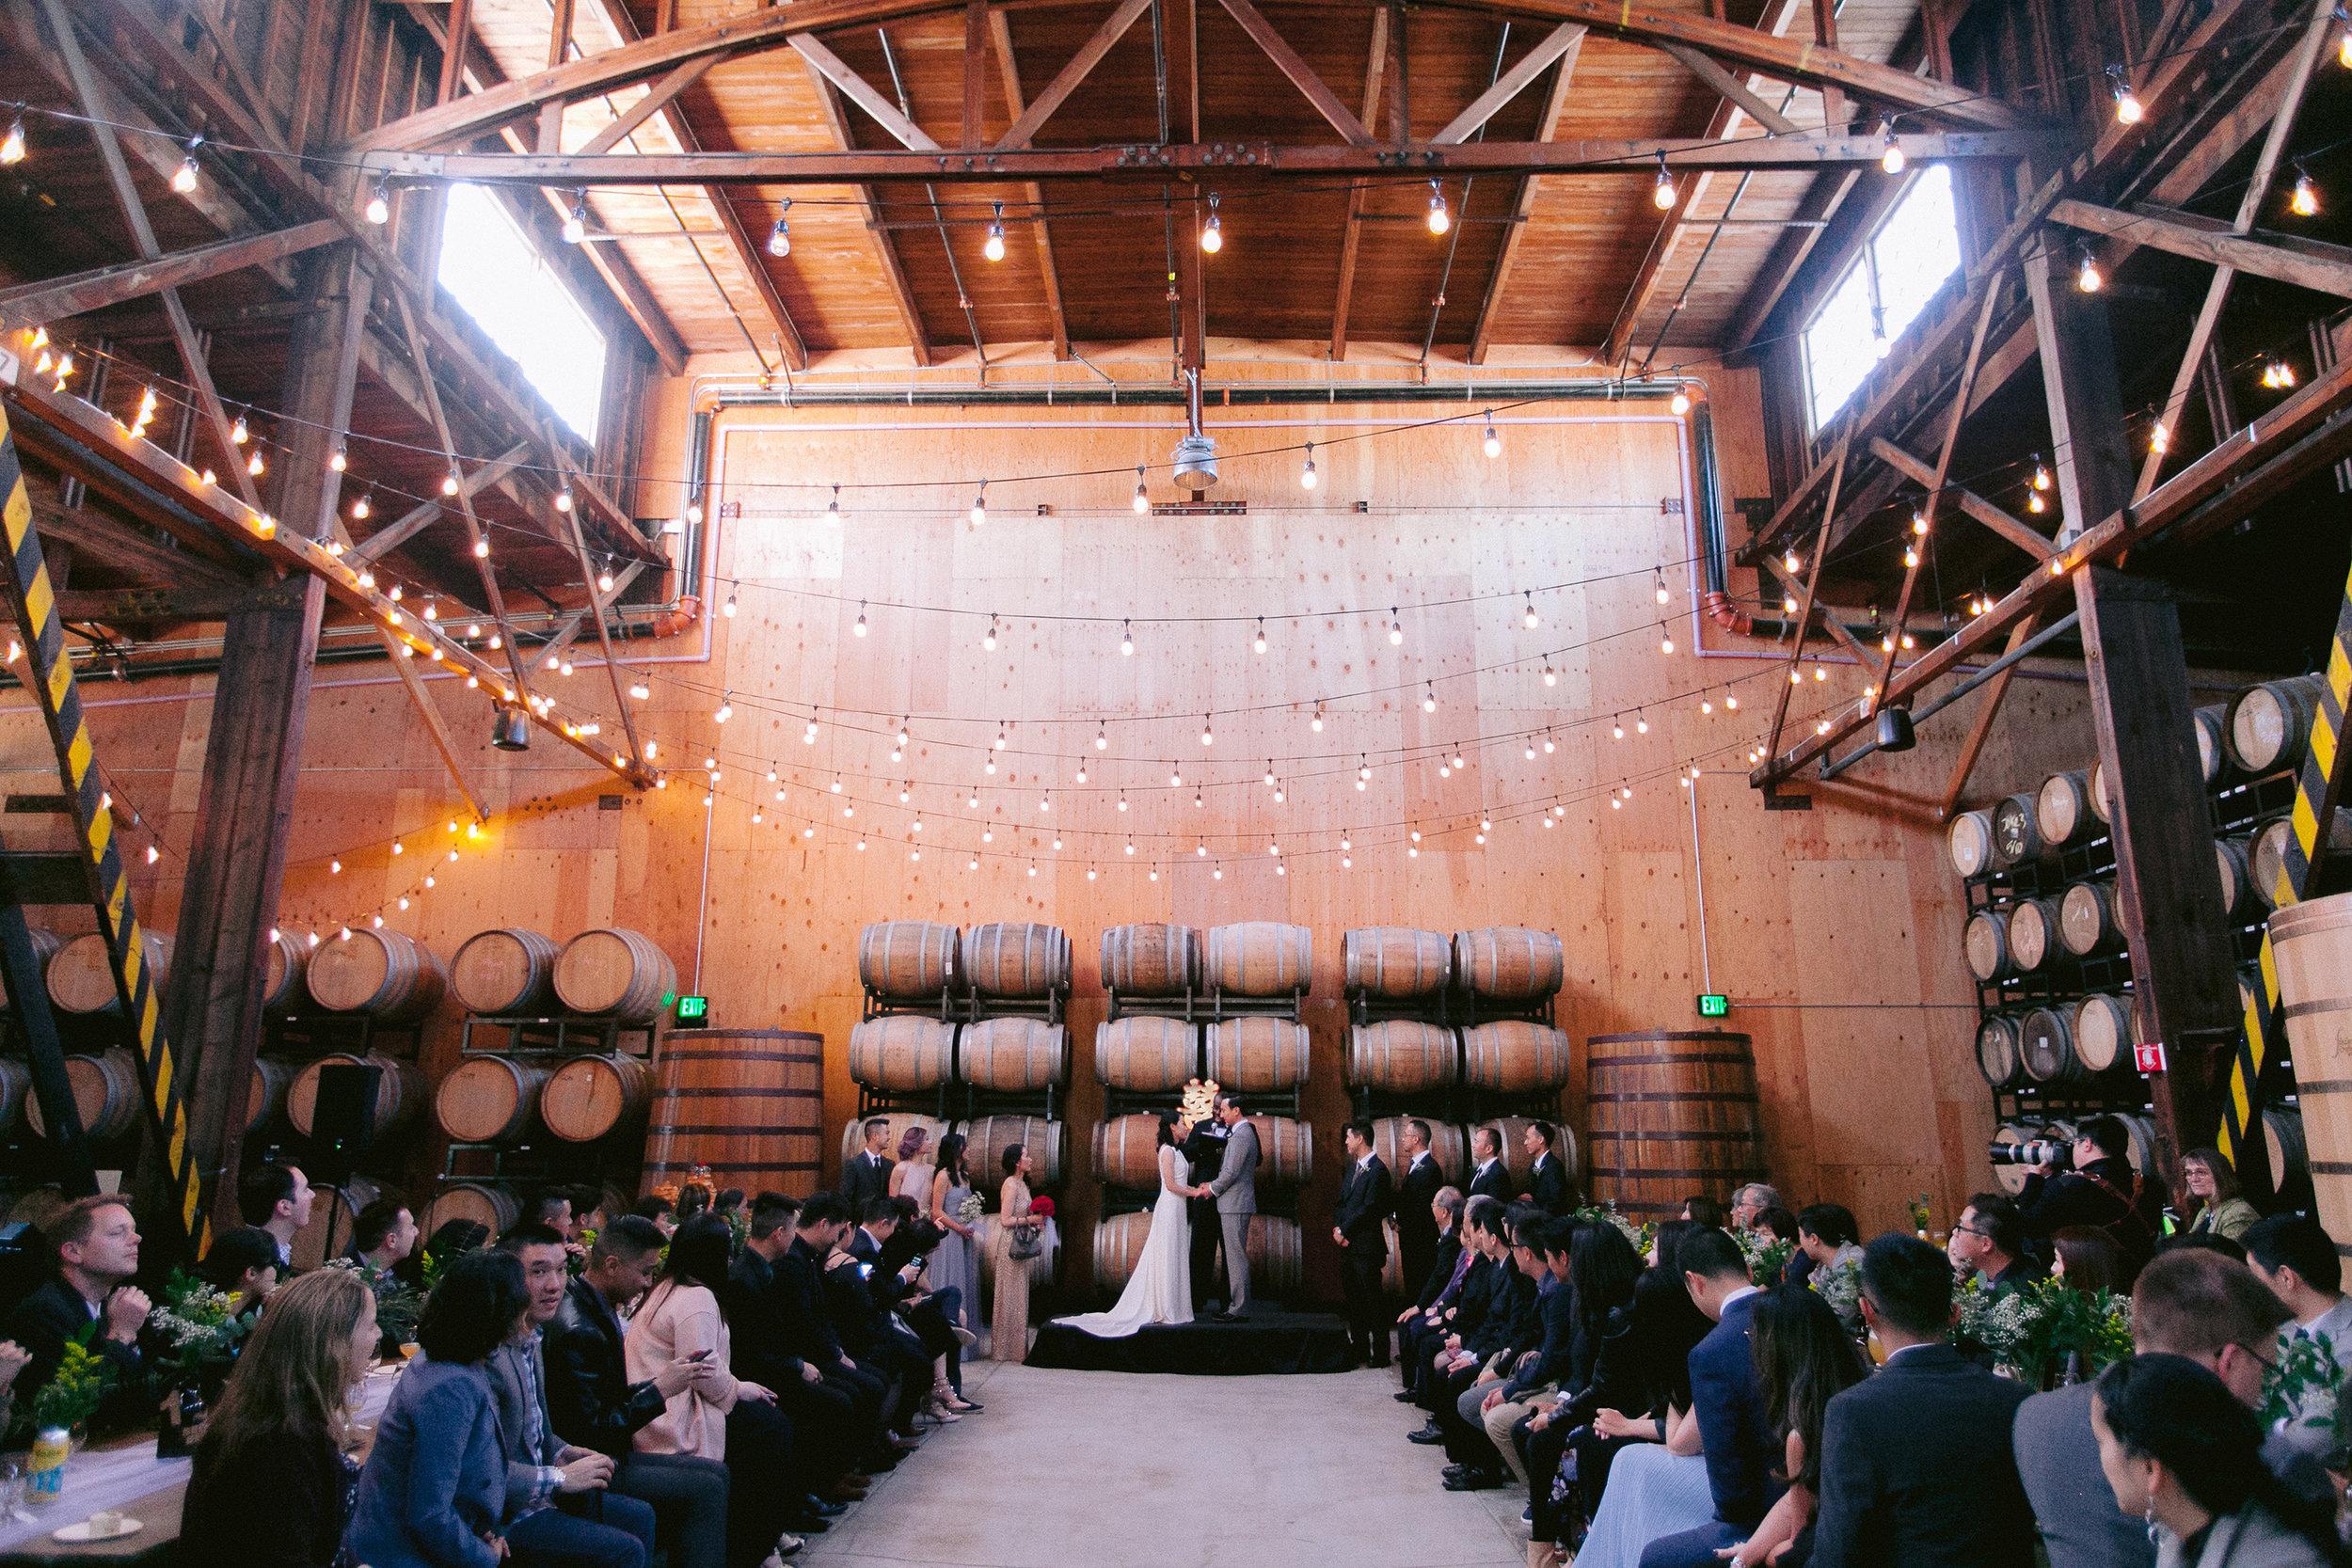 Almanac_Barrel_House_Wedding_014.jpg